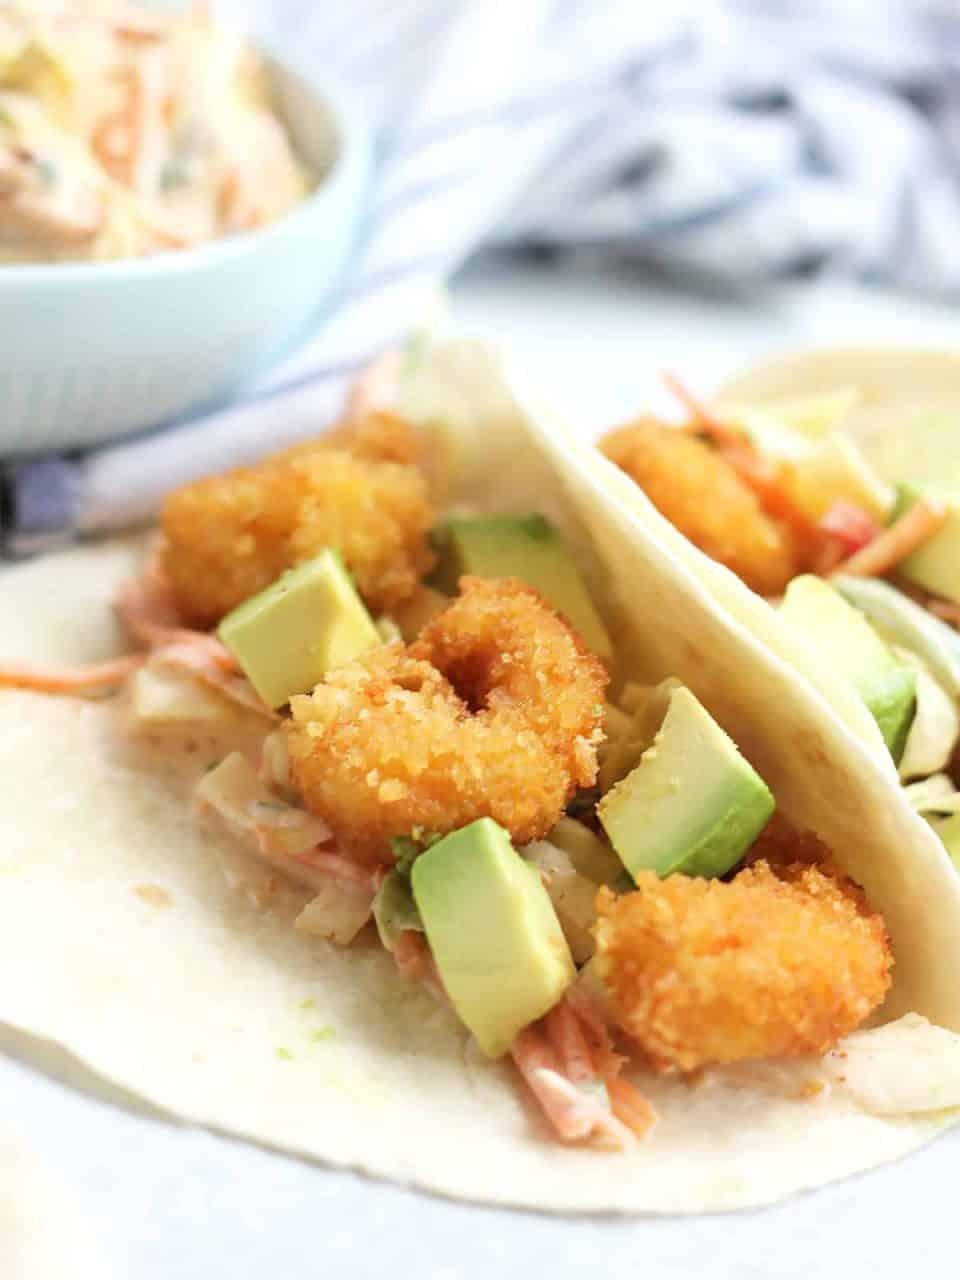 A folded fried shrimp taco with chunks of avocado.